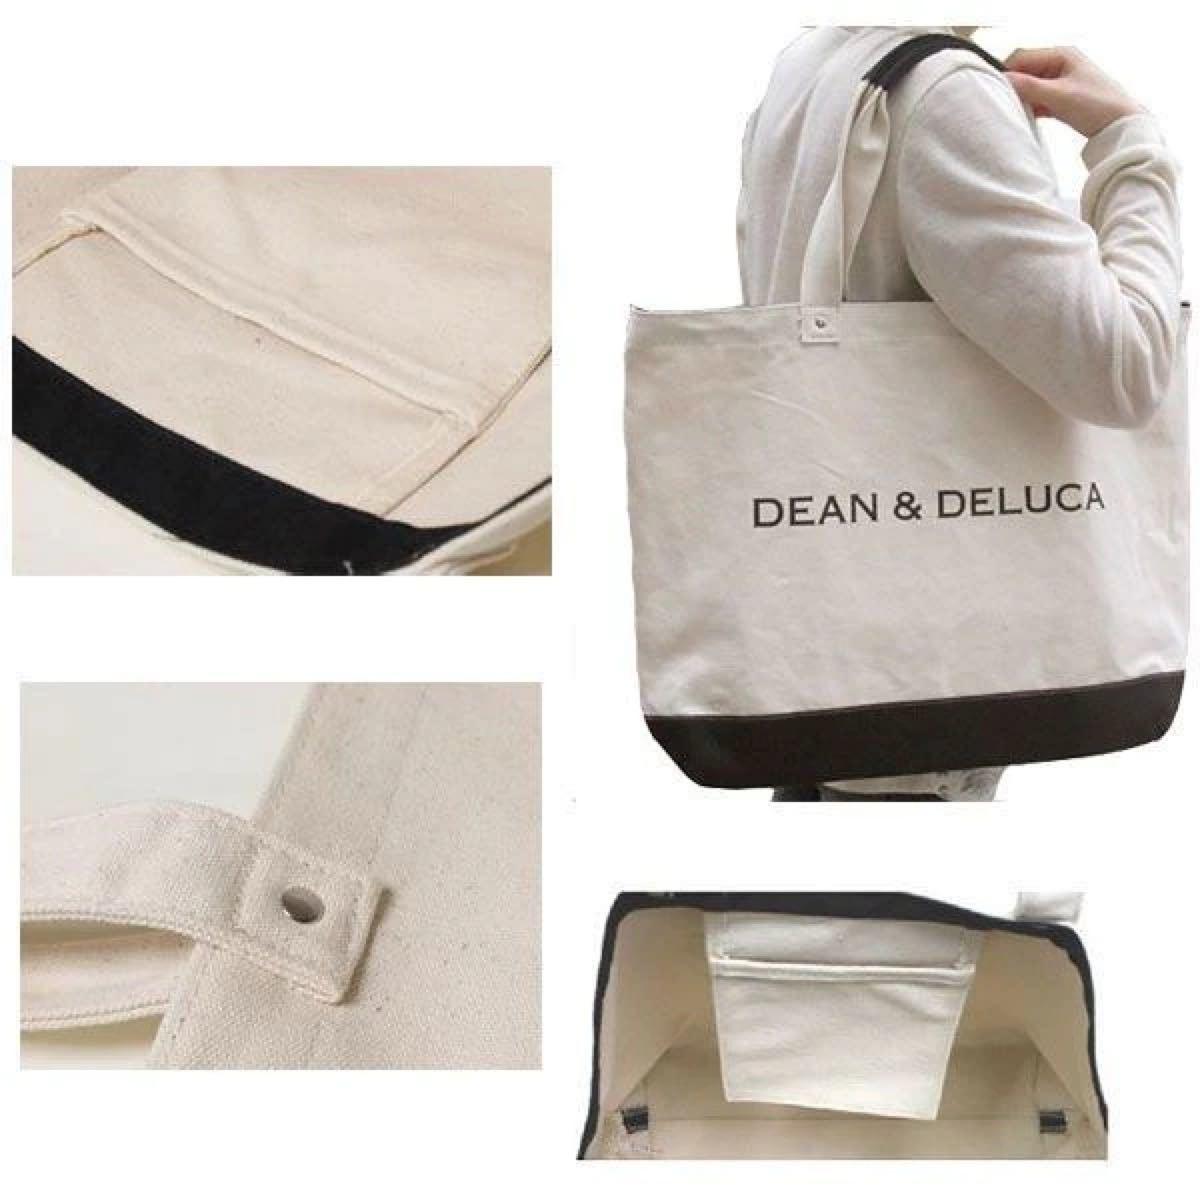 DEAN&DELUCA キャンバストートバッグ トートバッグ エコバッグ ディーンアンドデルーカ ディーン&デルーカ